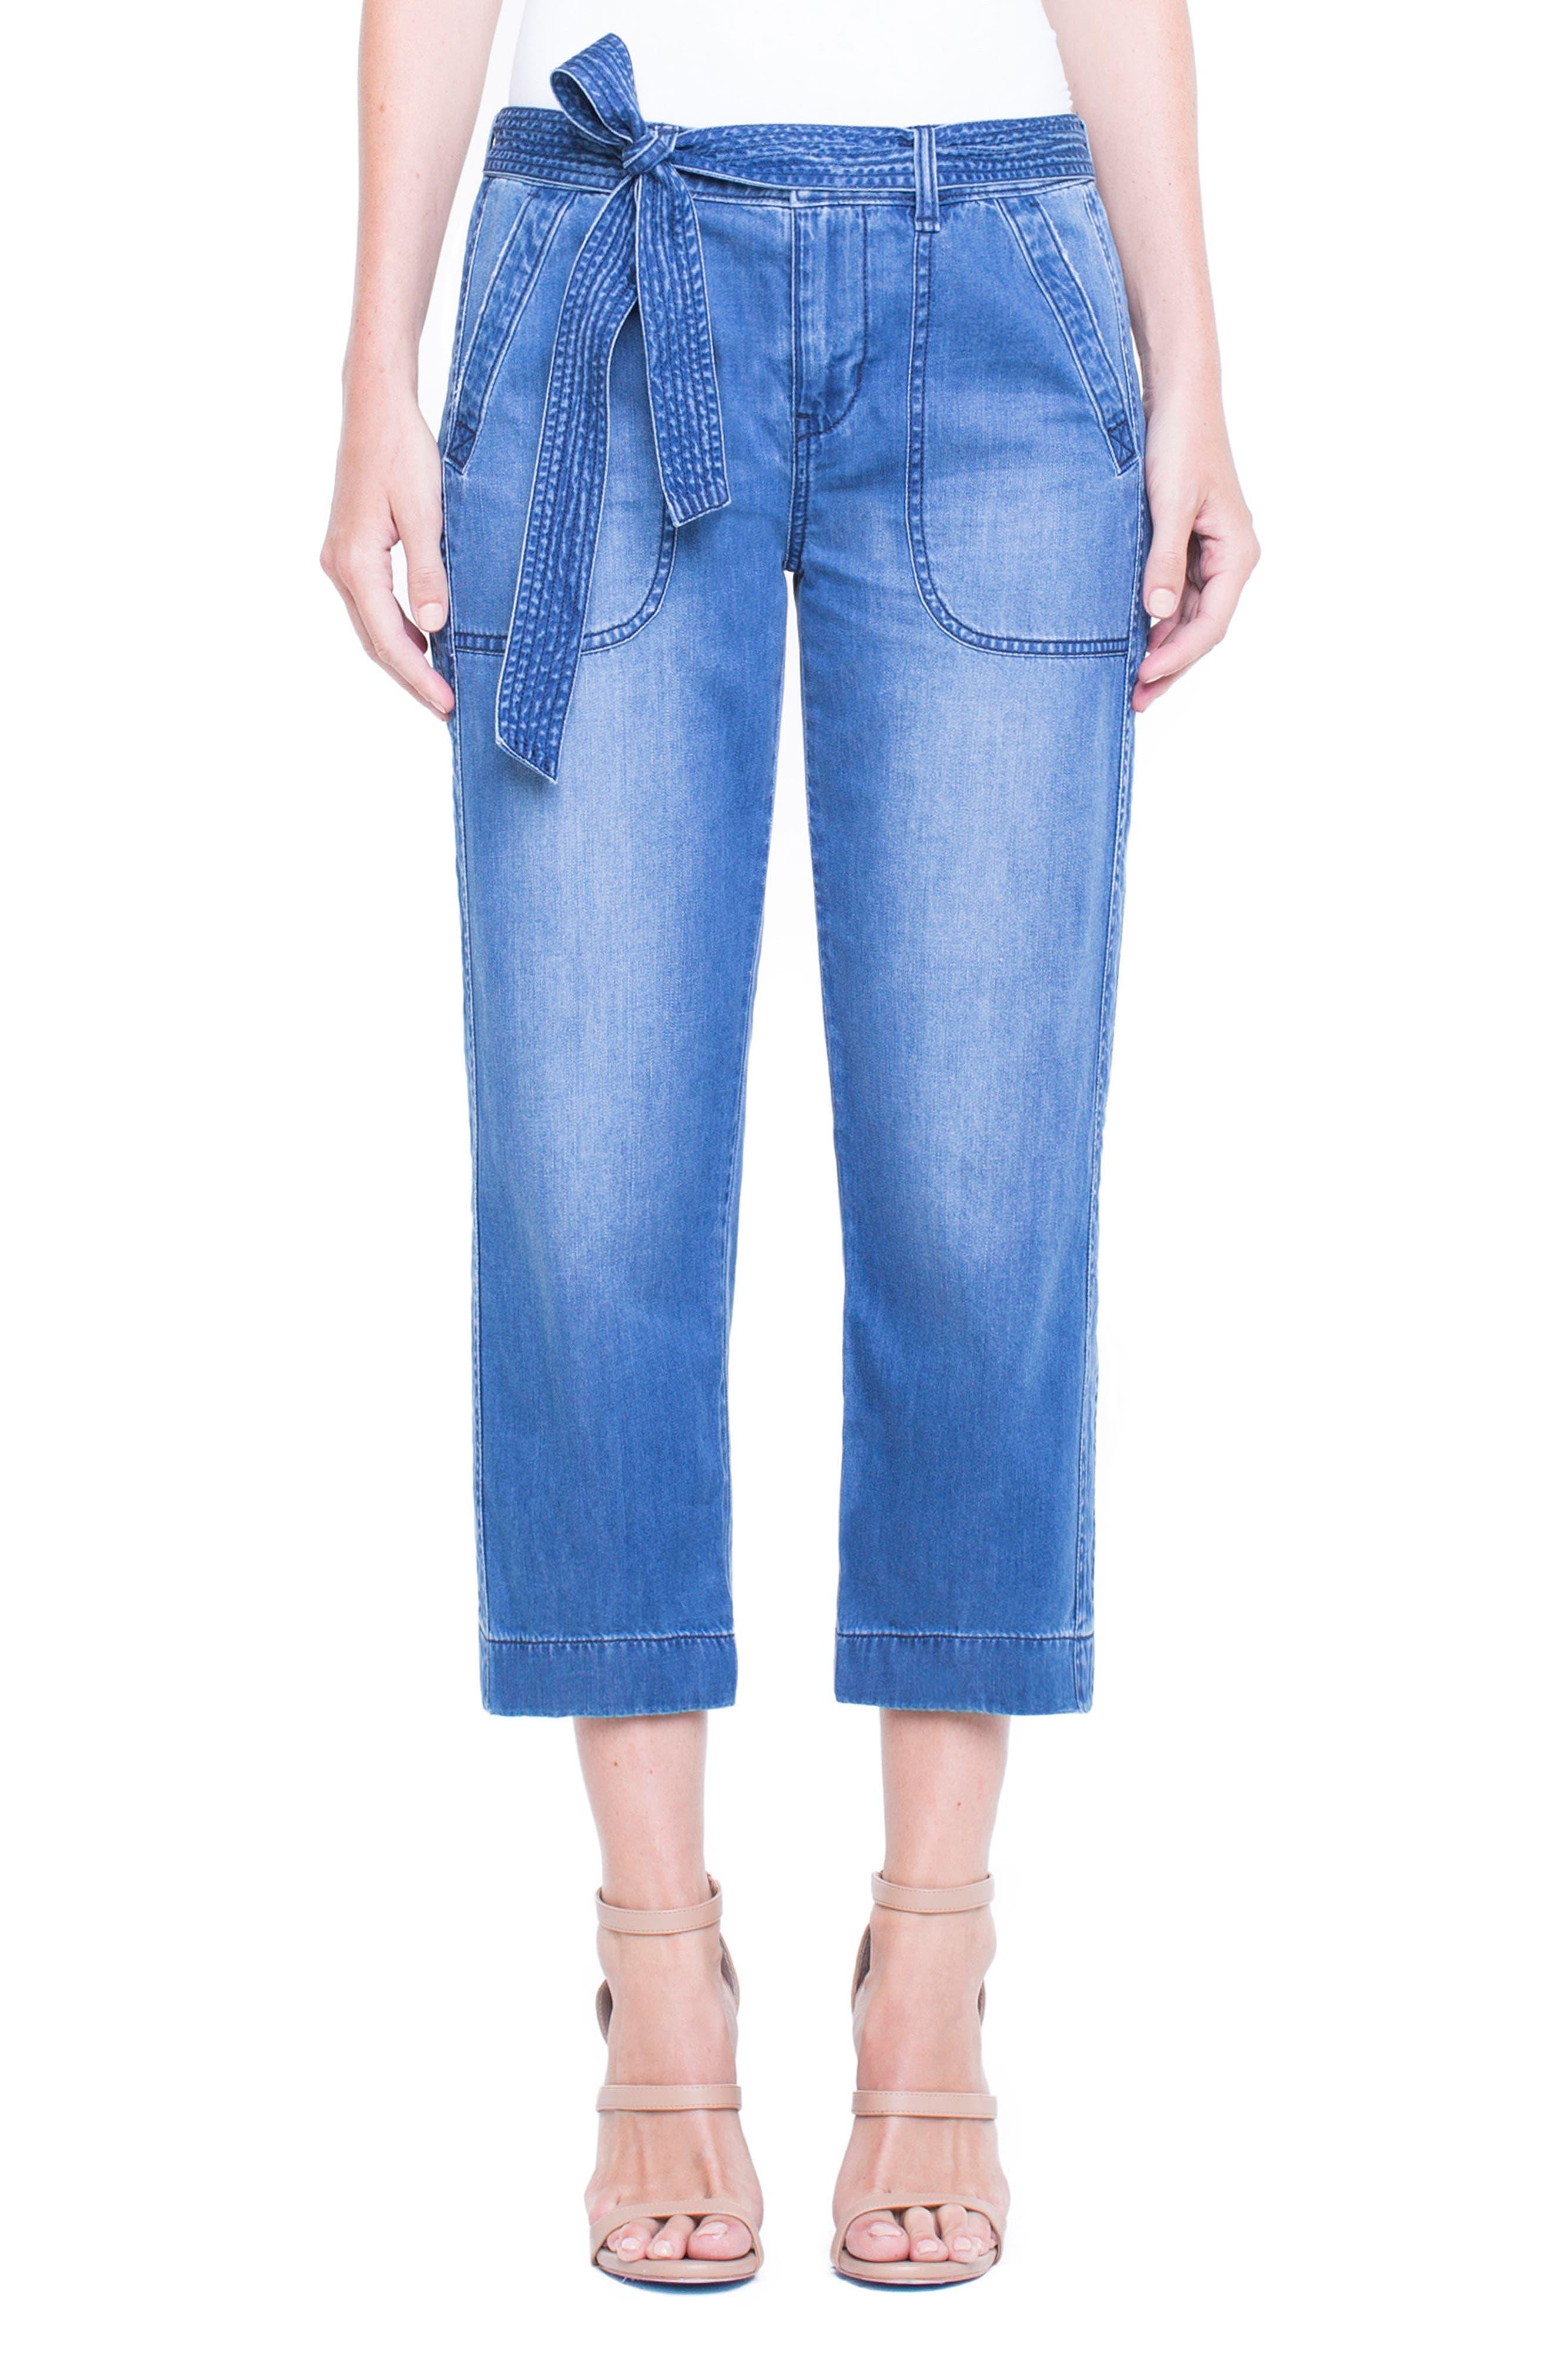 Alternate Image 1 Selected - Liverpool Jeans Company Norah Capri Jeans (Belfast Hand Sand)